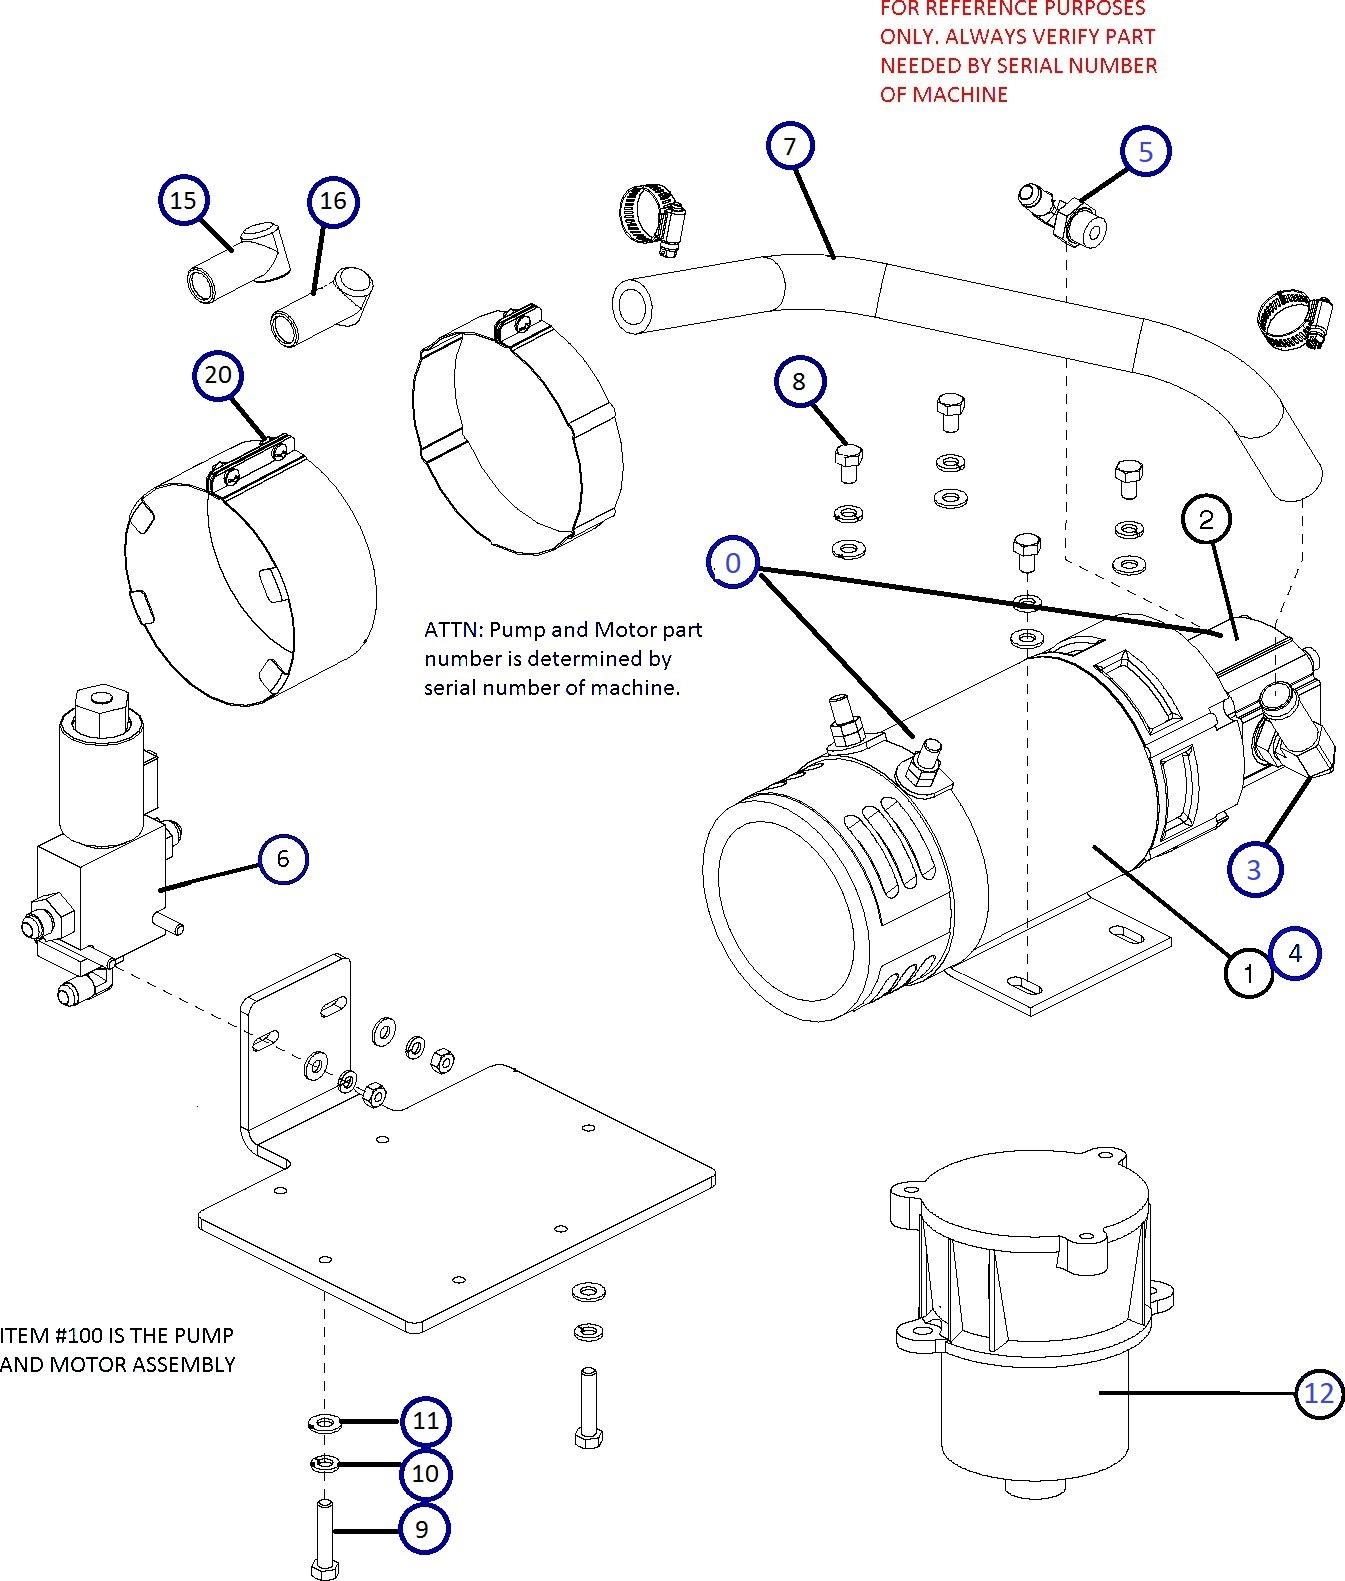 FV_9925] Fork Lift Electric Motor Wiring Diagram Free Diagram